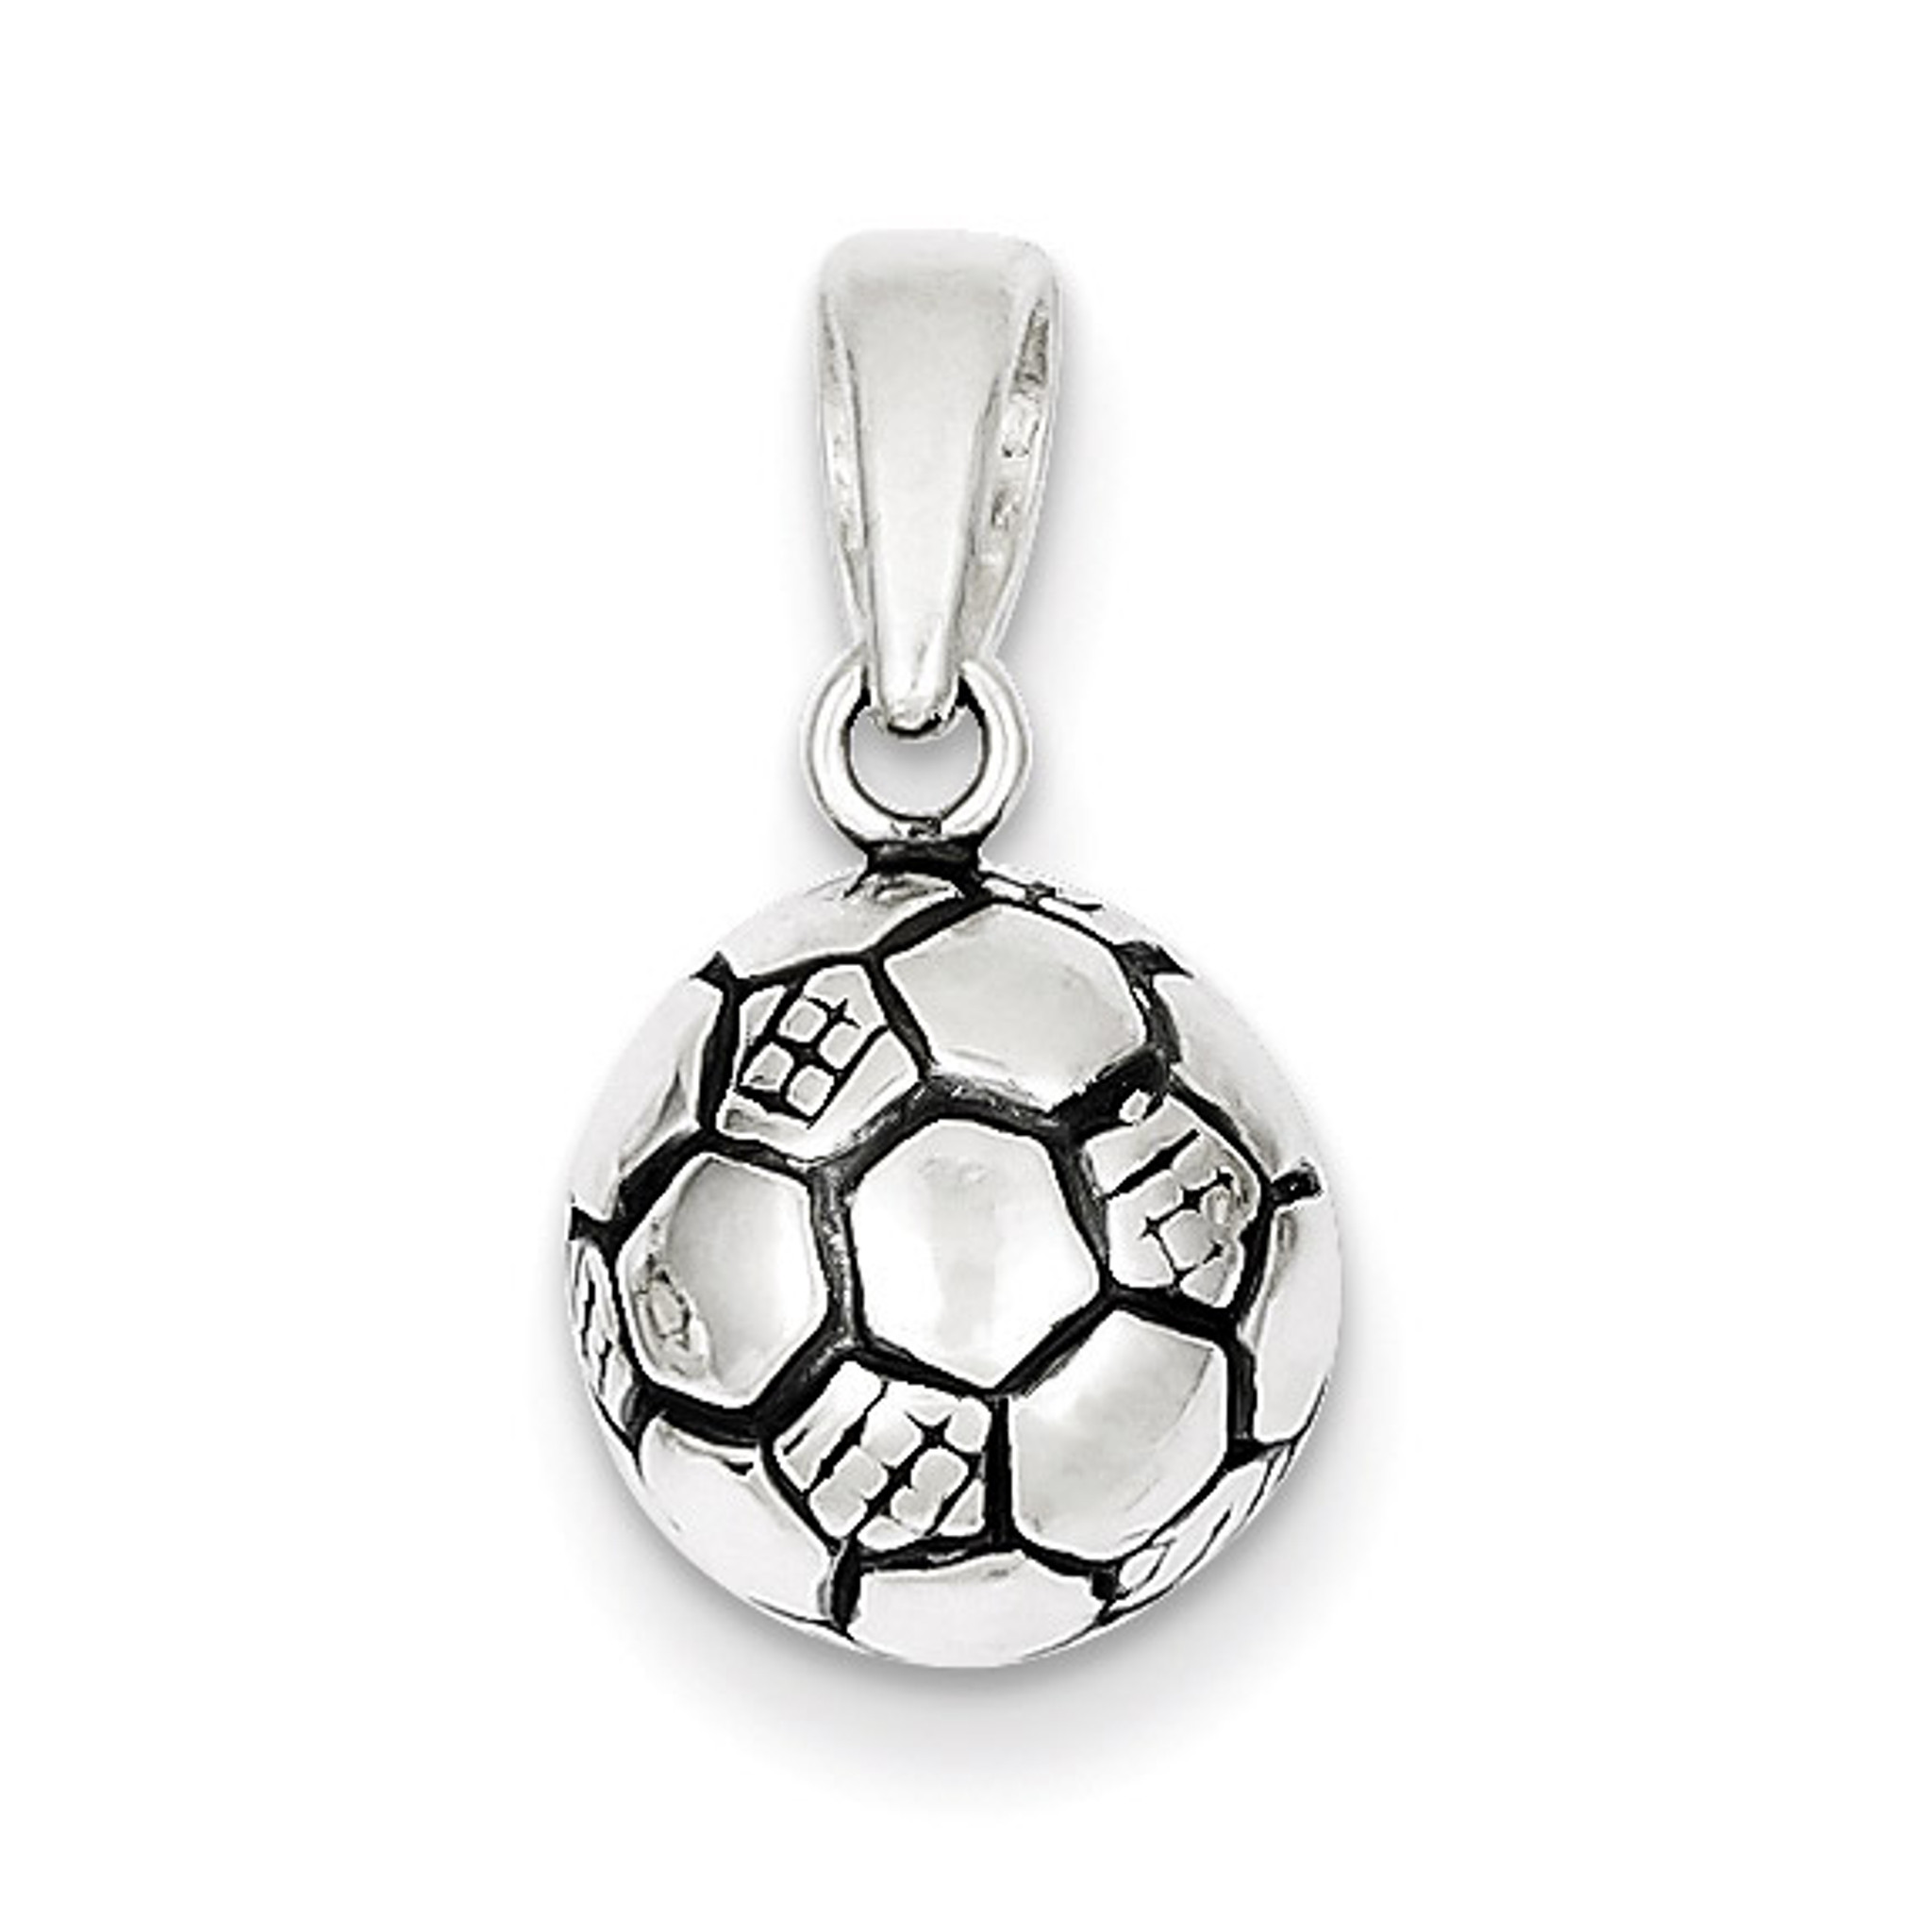 Sterling Silver Antiqued Soccer Ball Pendant